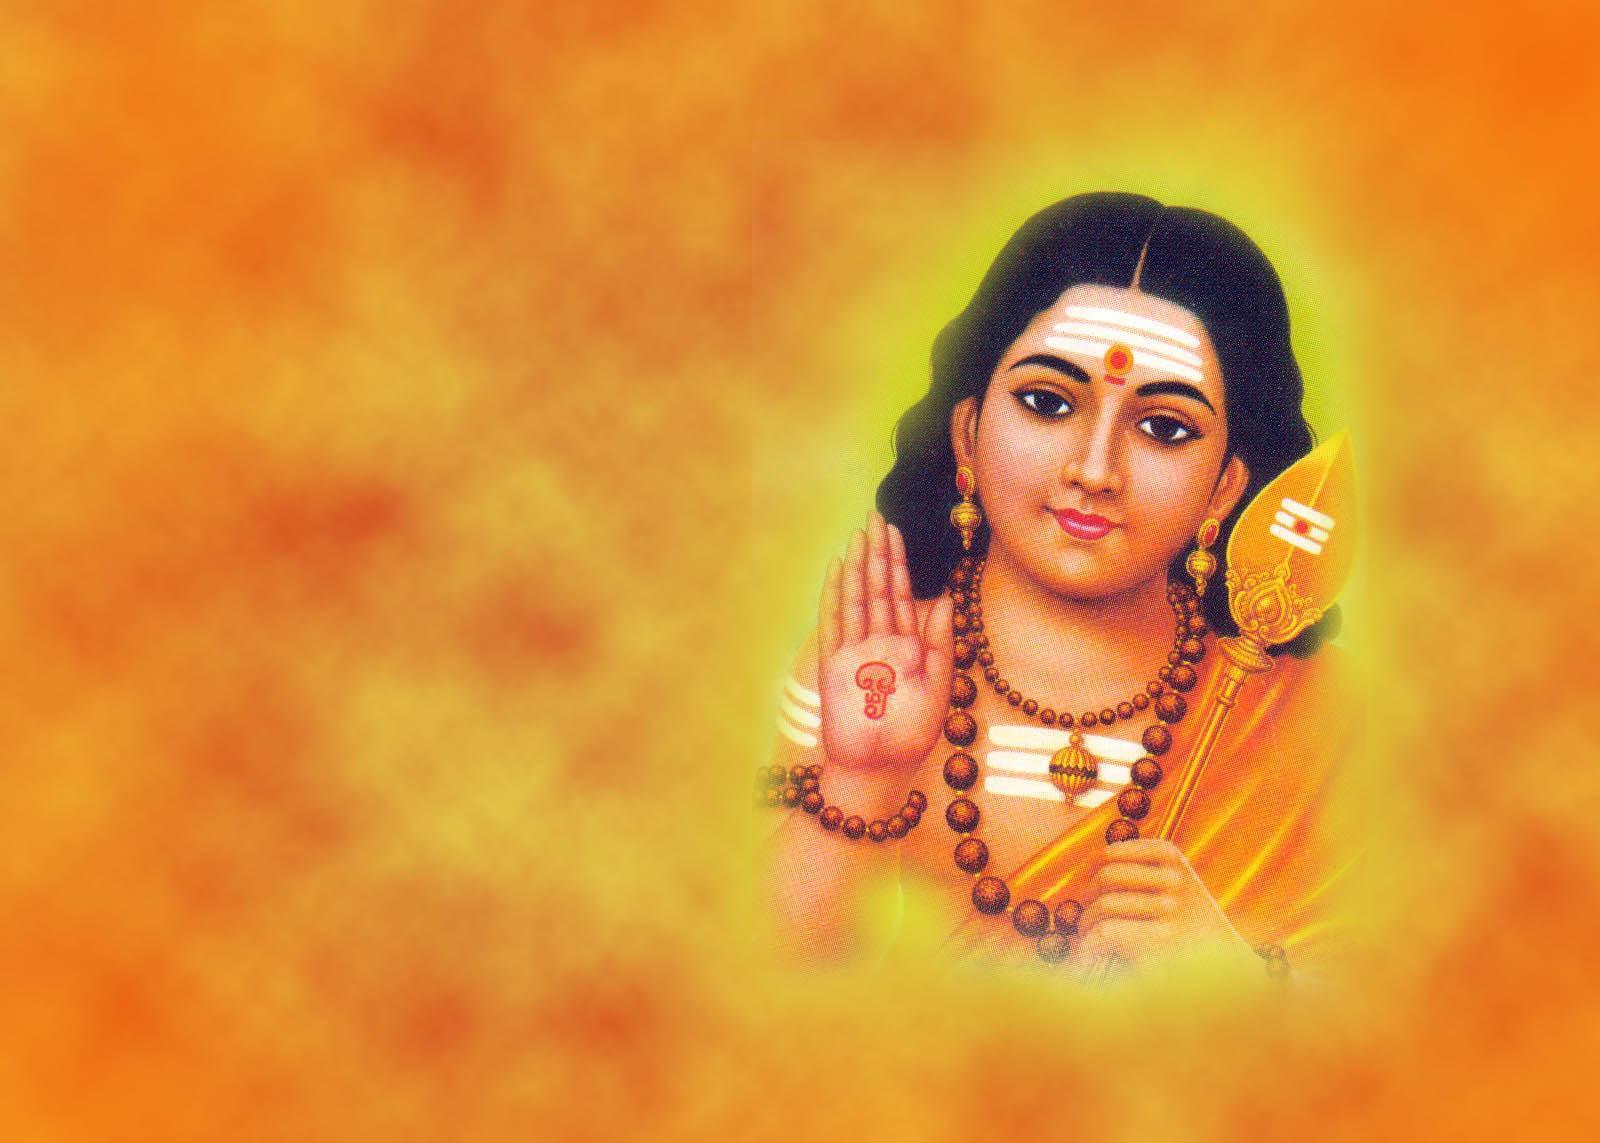 Hanuman Animated Wallpaper All New Pix1 Wallpaper God Murugan